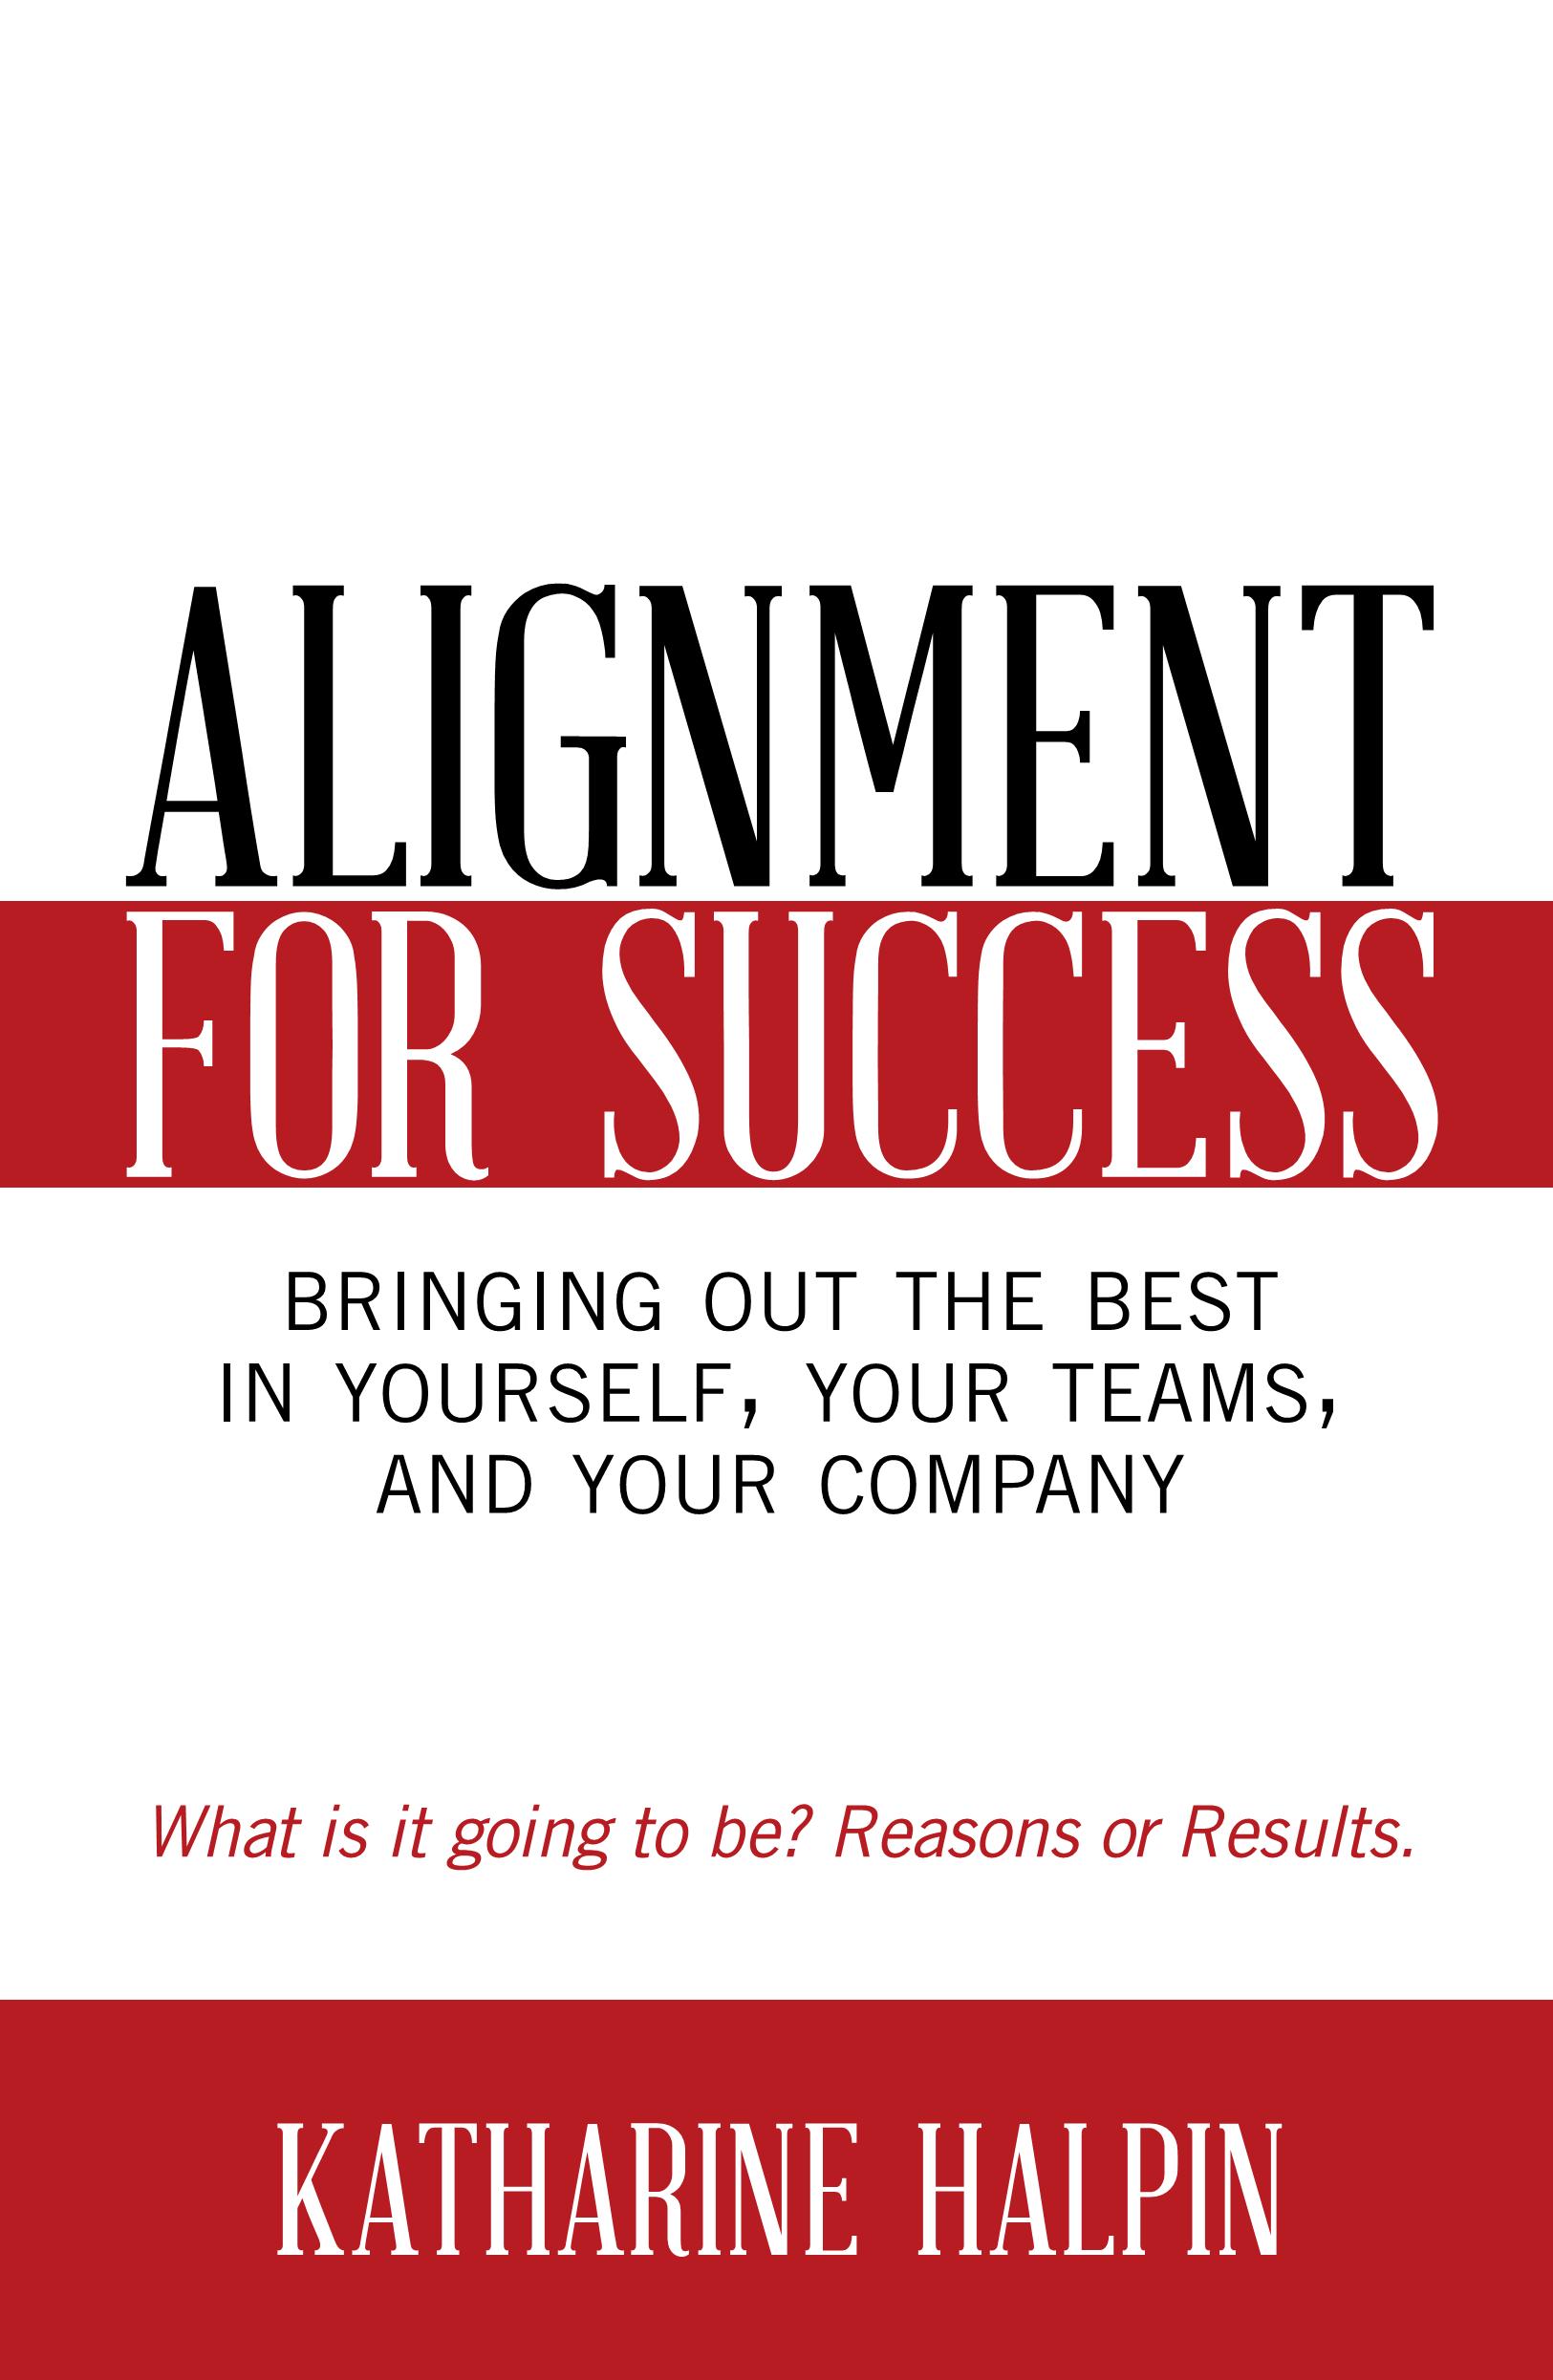 Alignment for Success